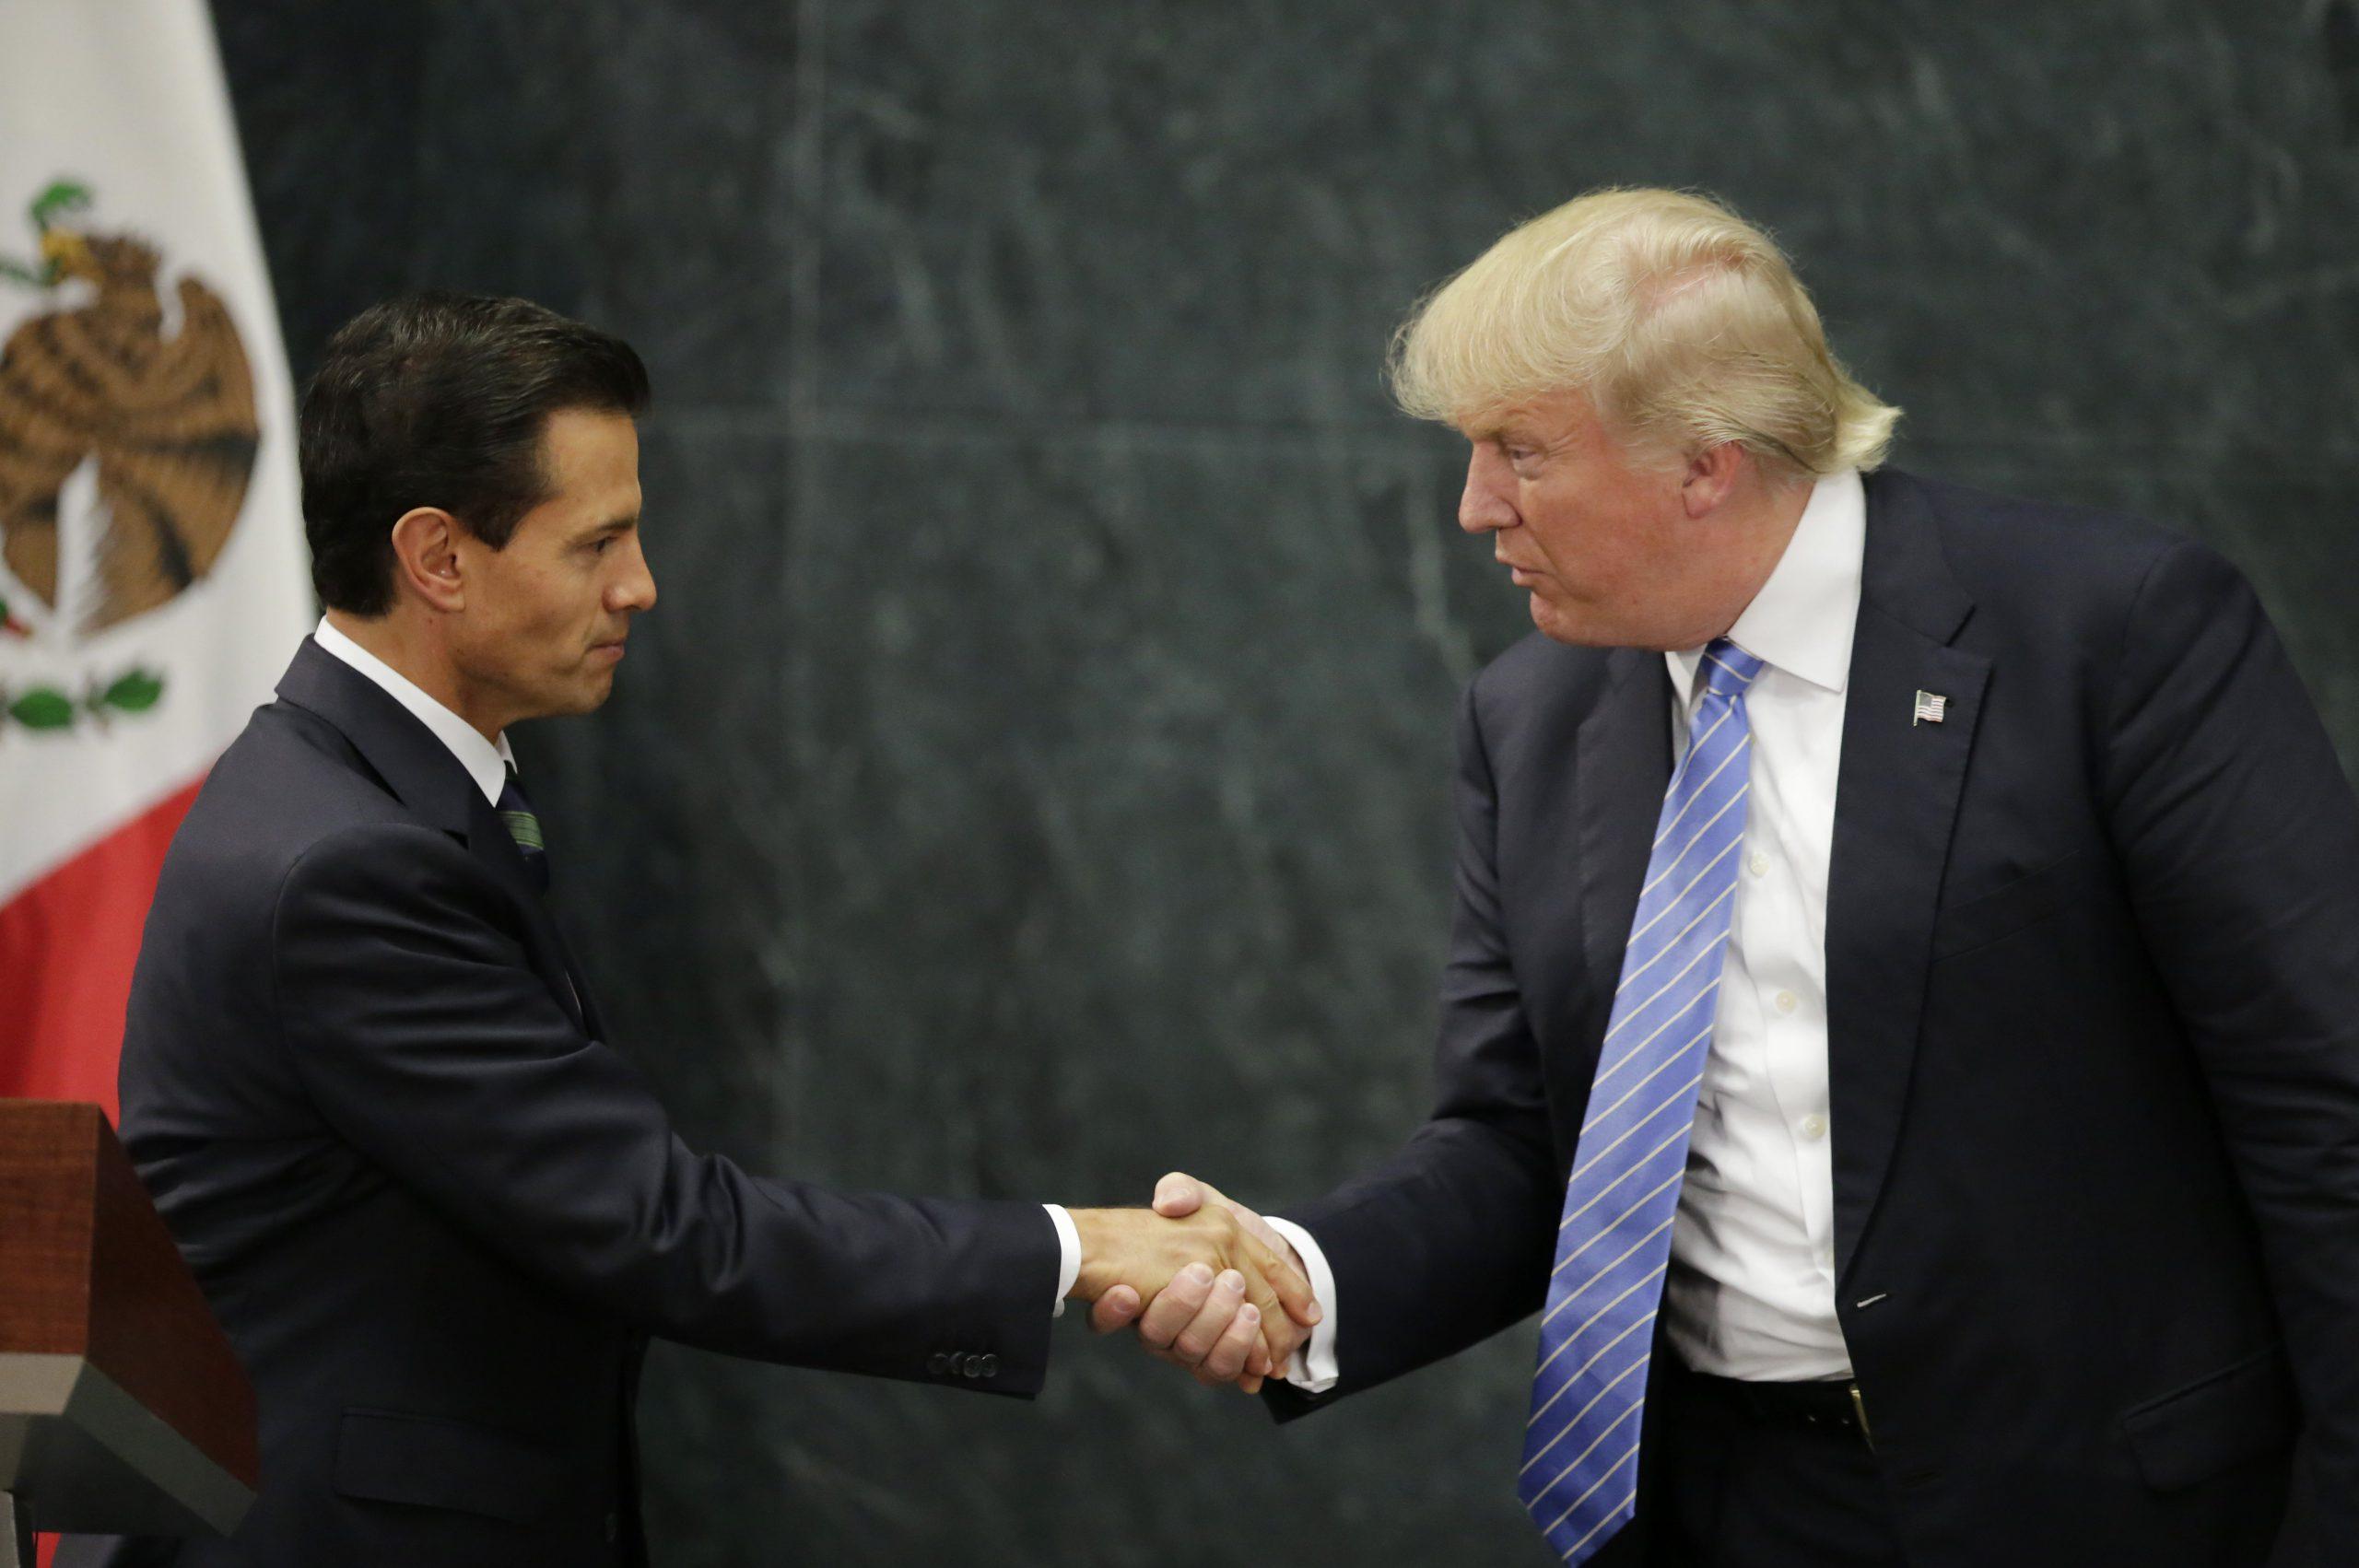 A disastrous Trump visit